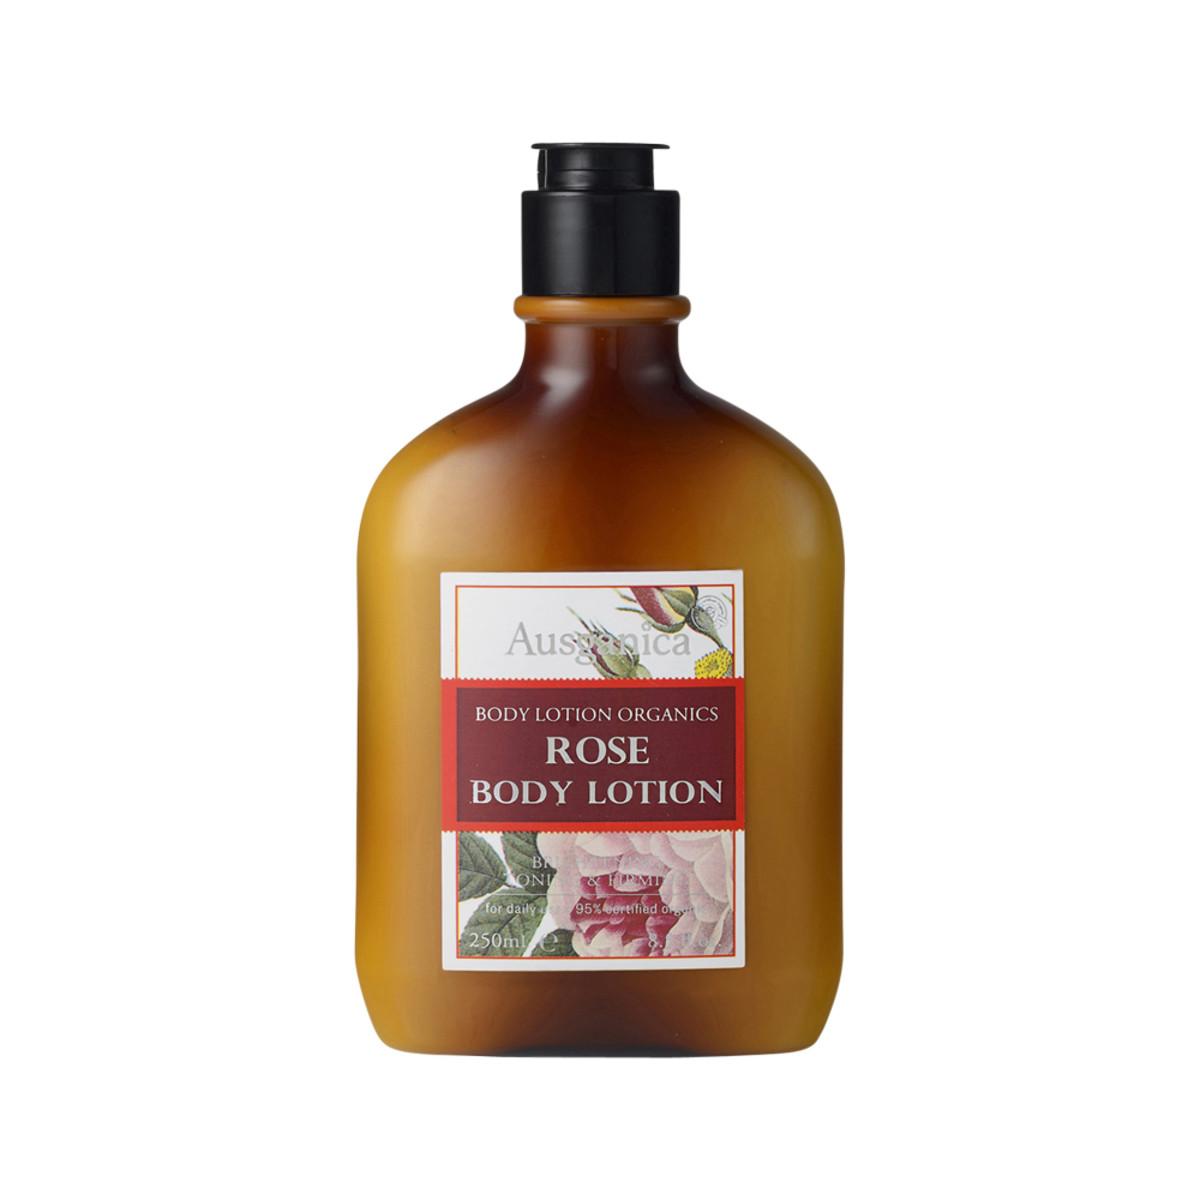 Ausganica Organic Rose Body Lotion